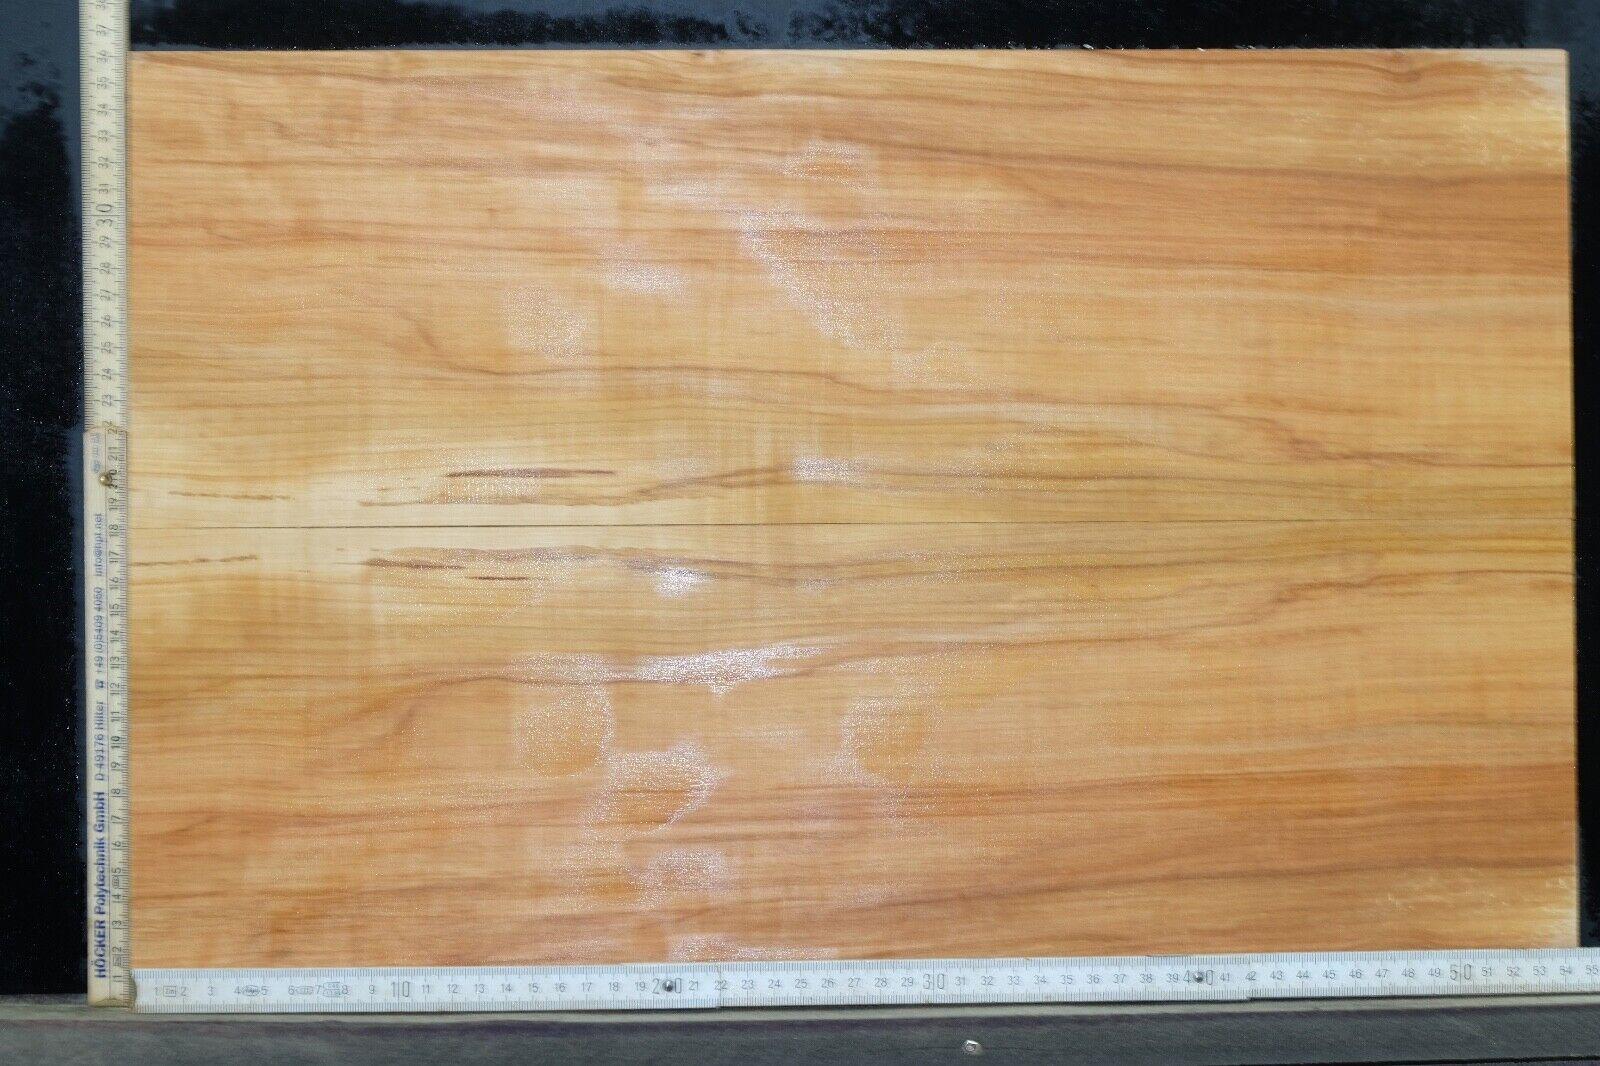 Tonewood Apfel 5,8 mm Aufleimer Figurot Topset Guitar Luthier Tonholz Droptop 23